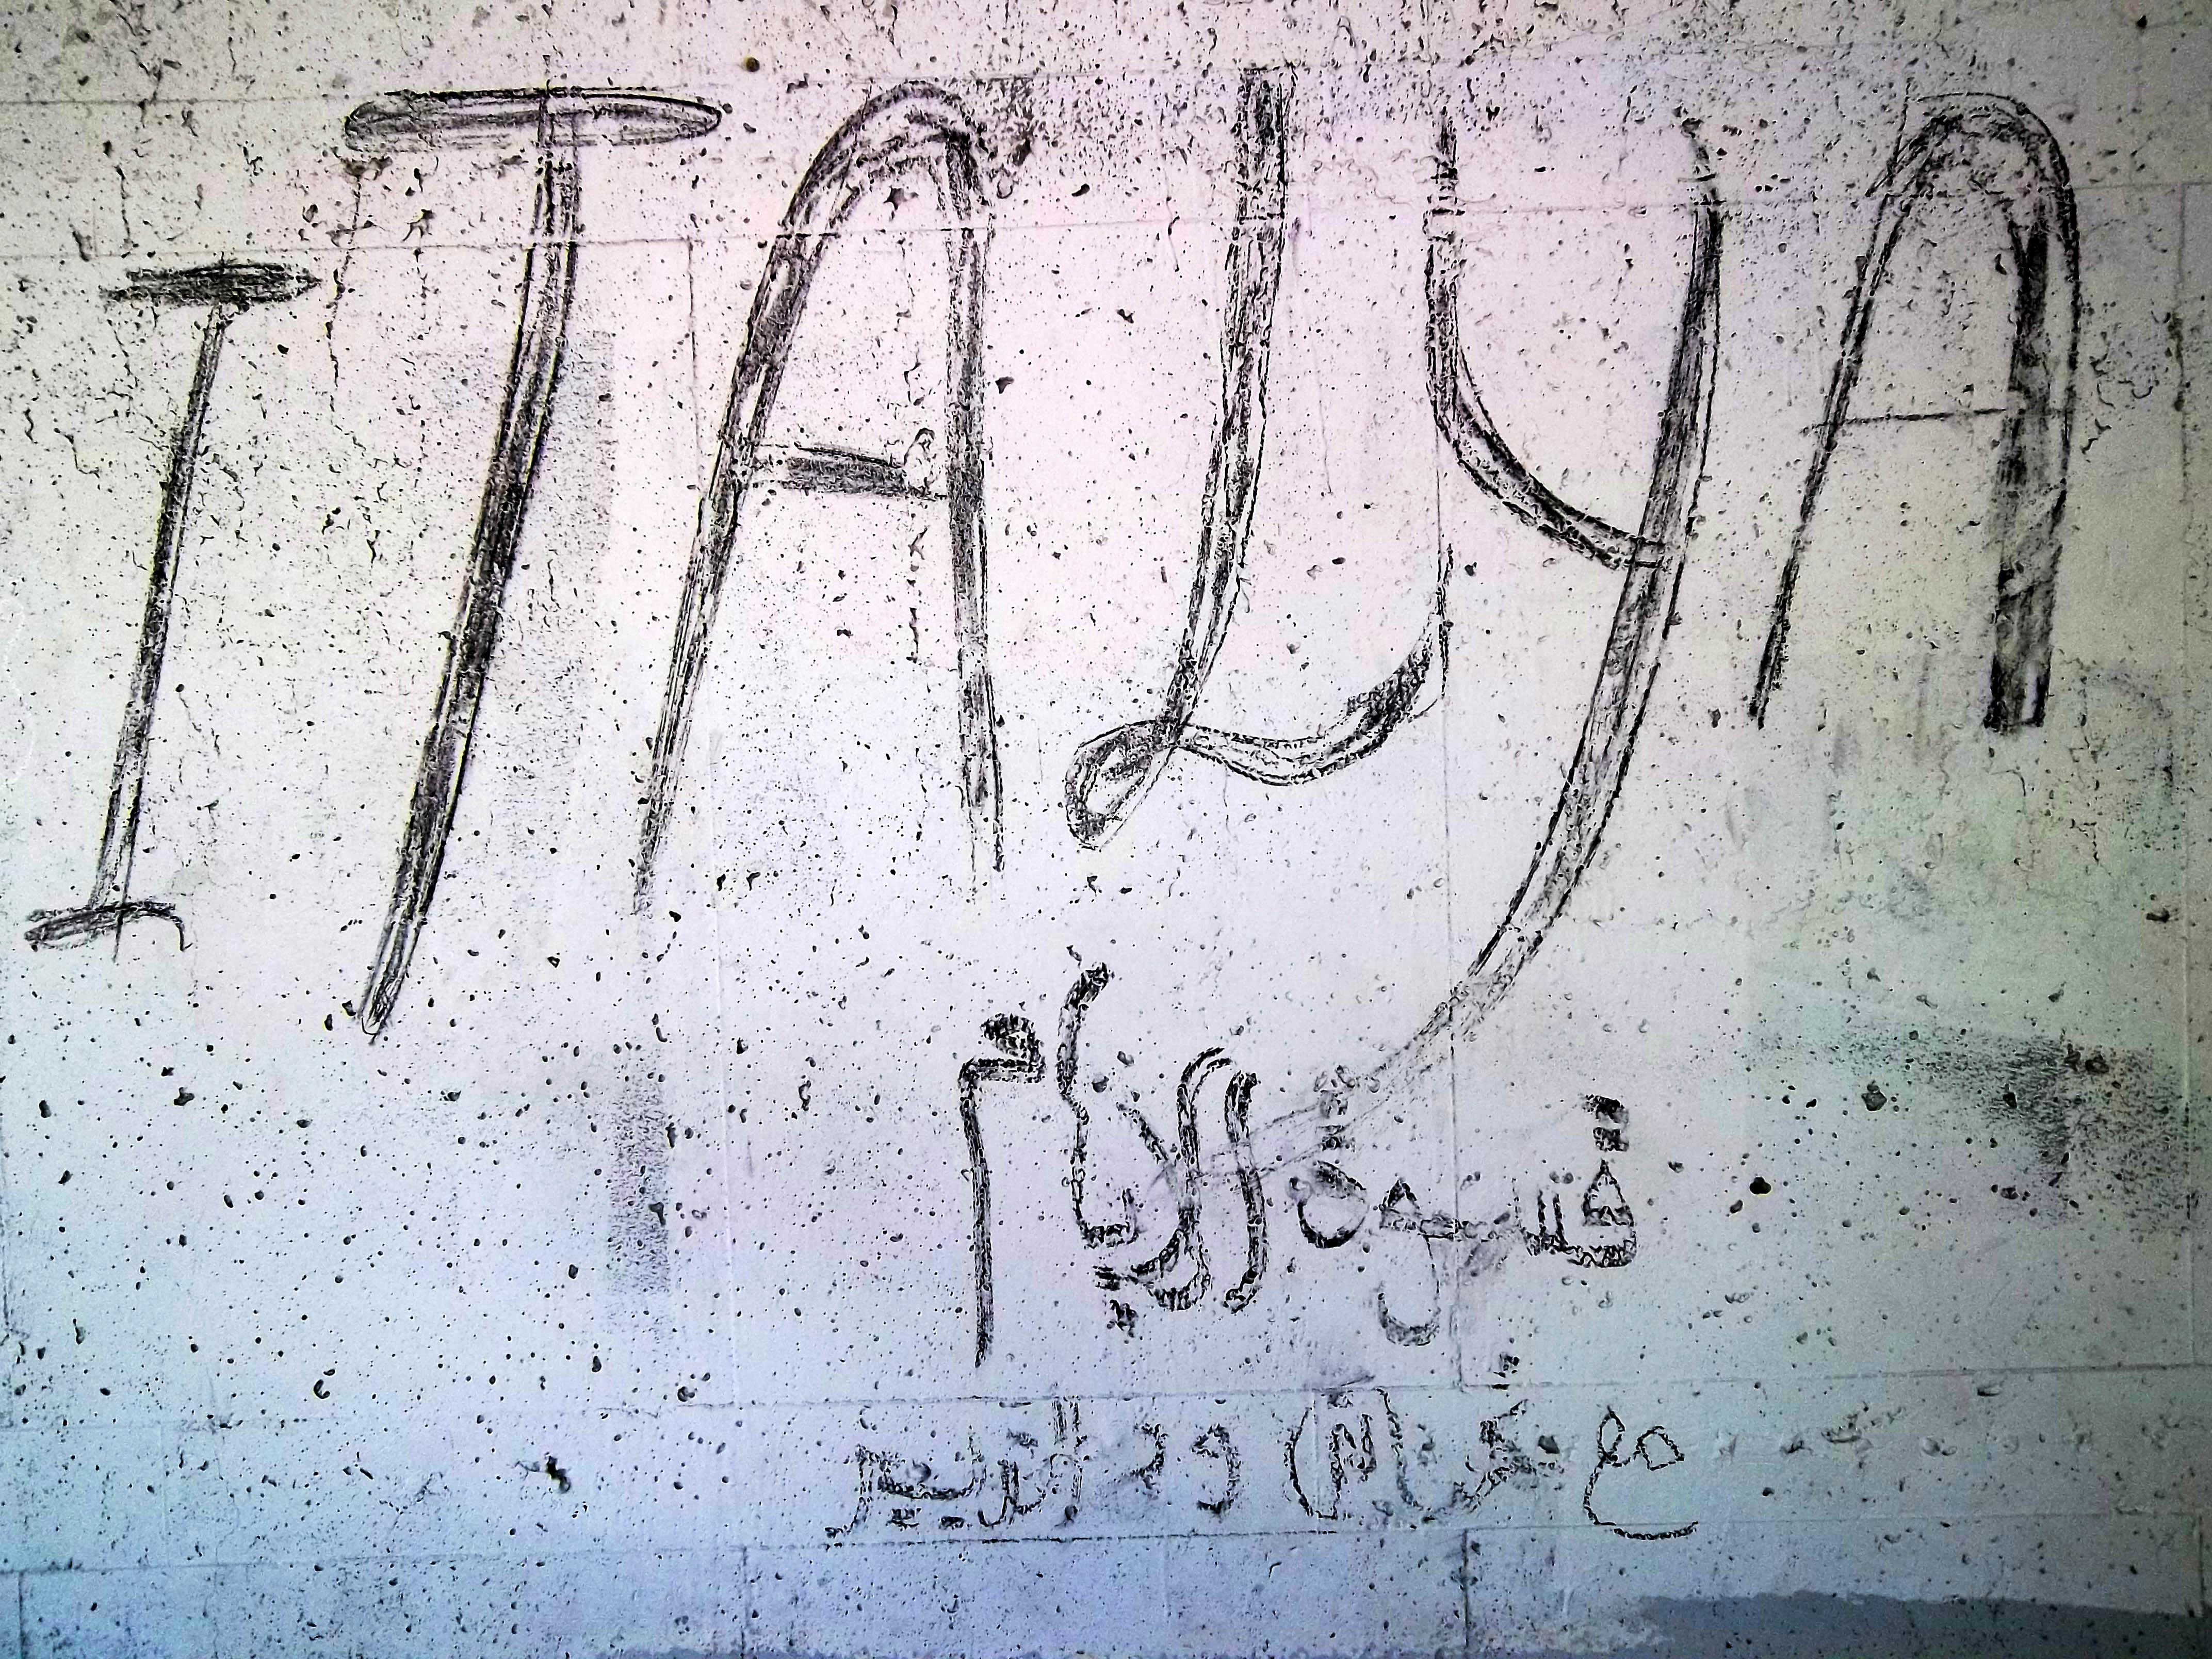 Graffiti a Igoumenitsa - P.Martino